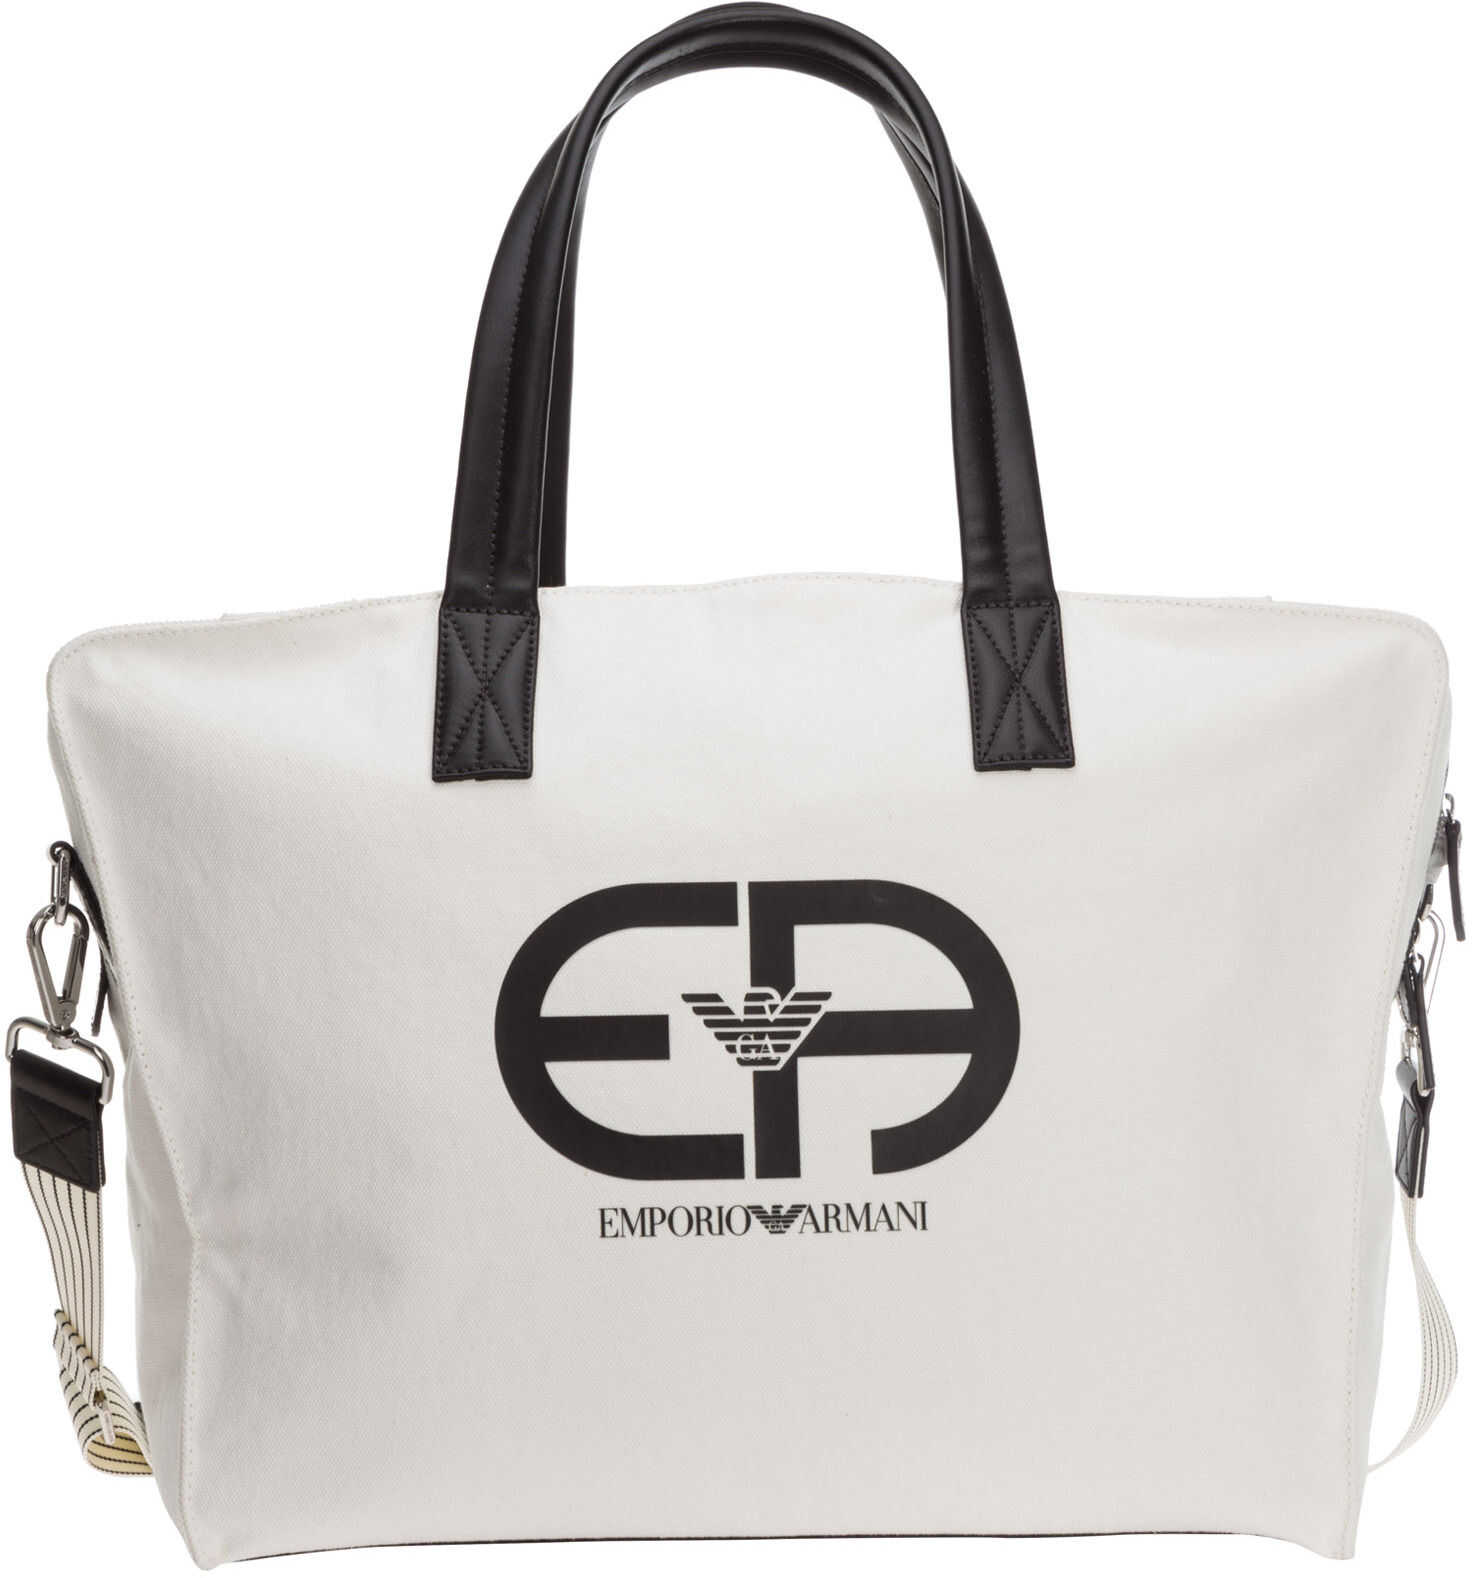 Emporio Armani Shoulder Bag Y4Q305Y025E84915 White imagine b-mall.ro